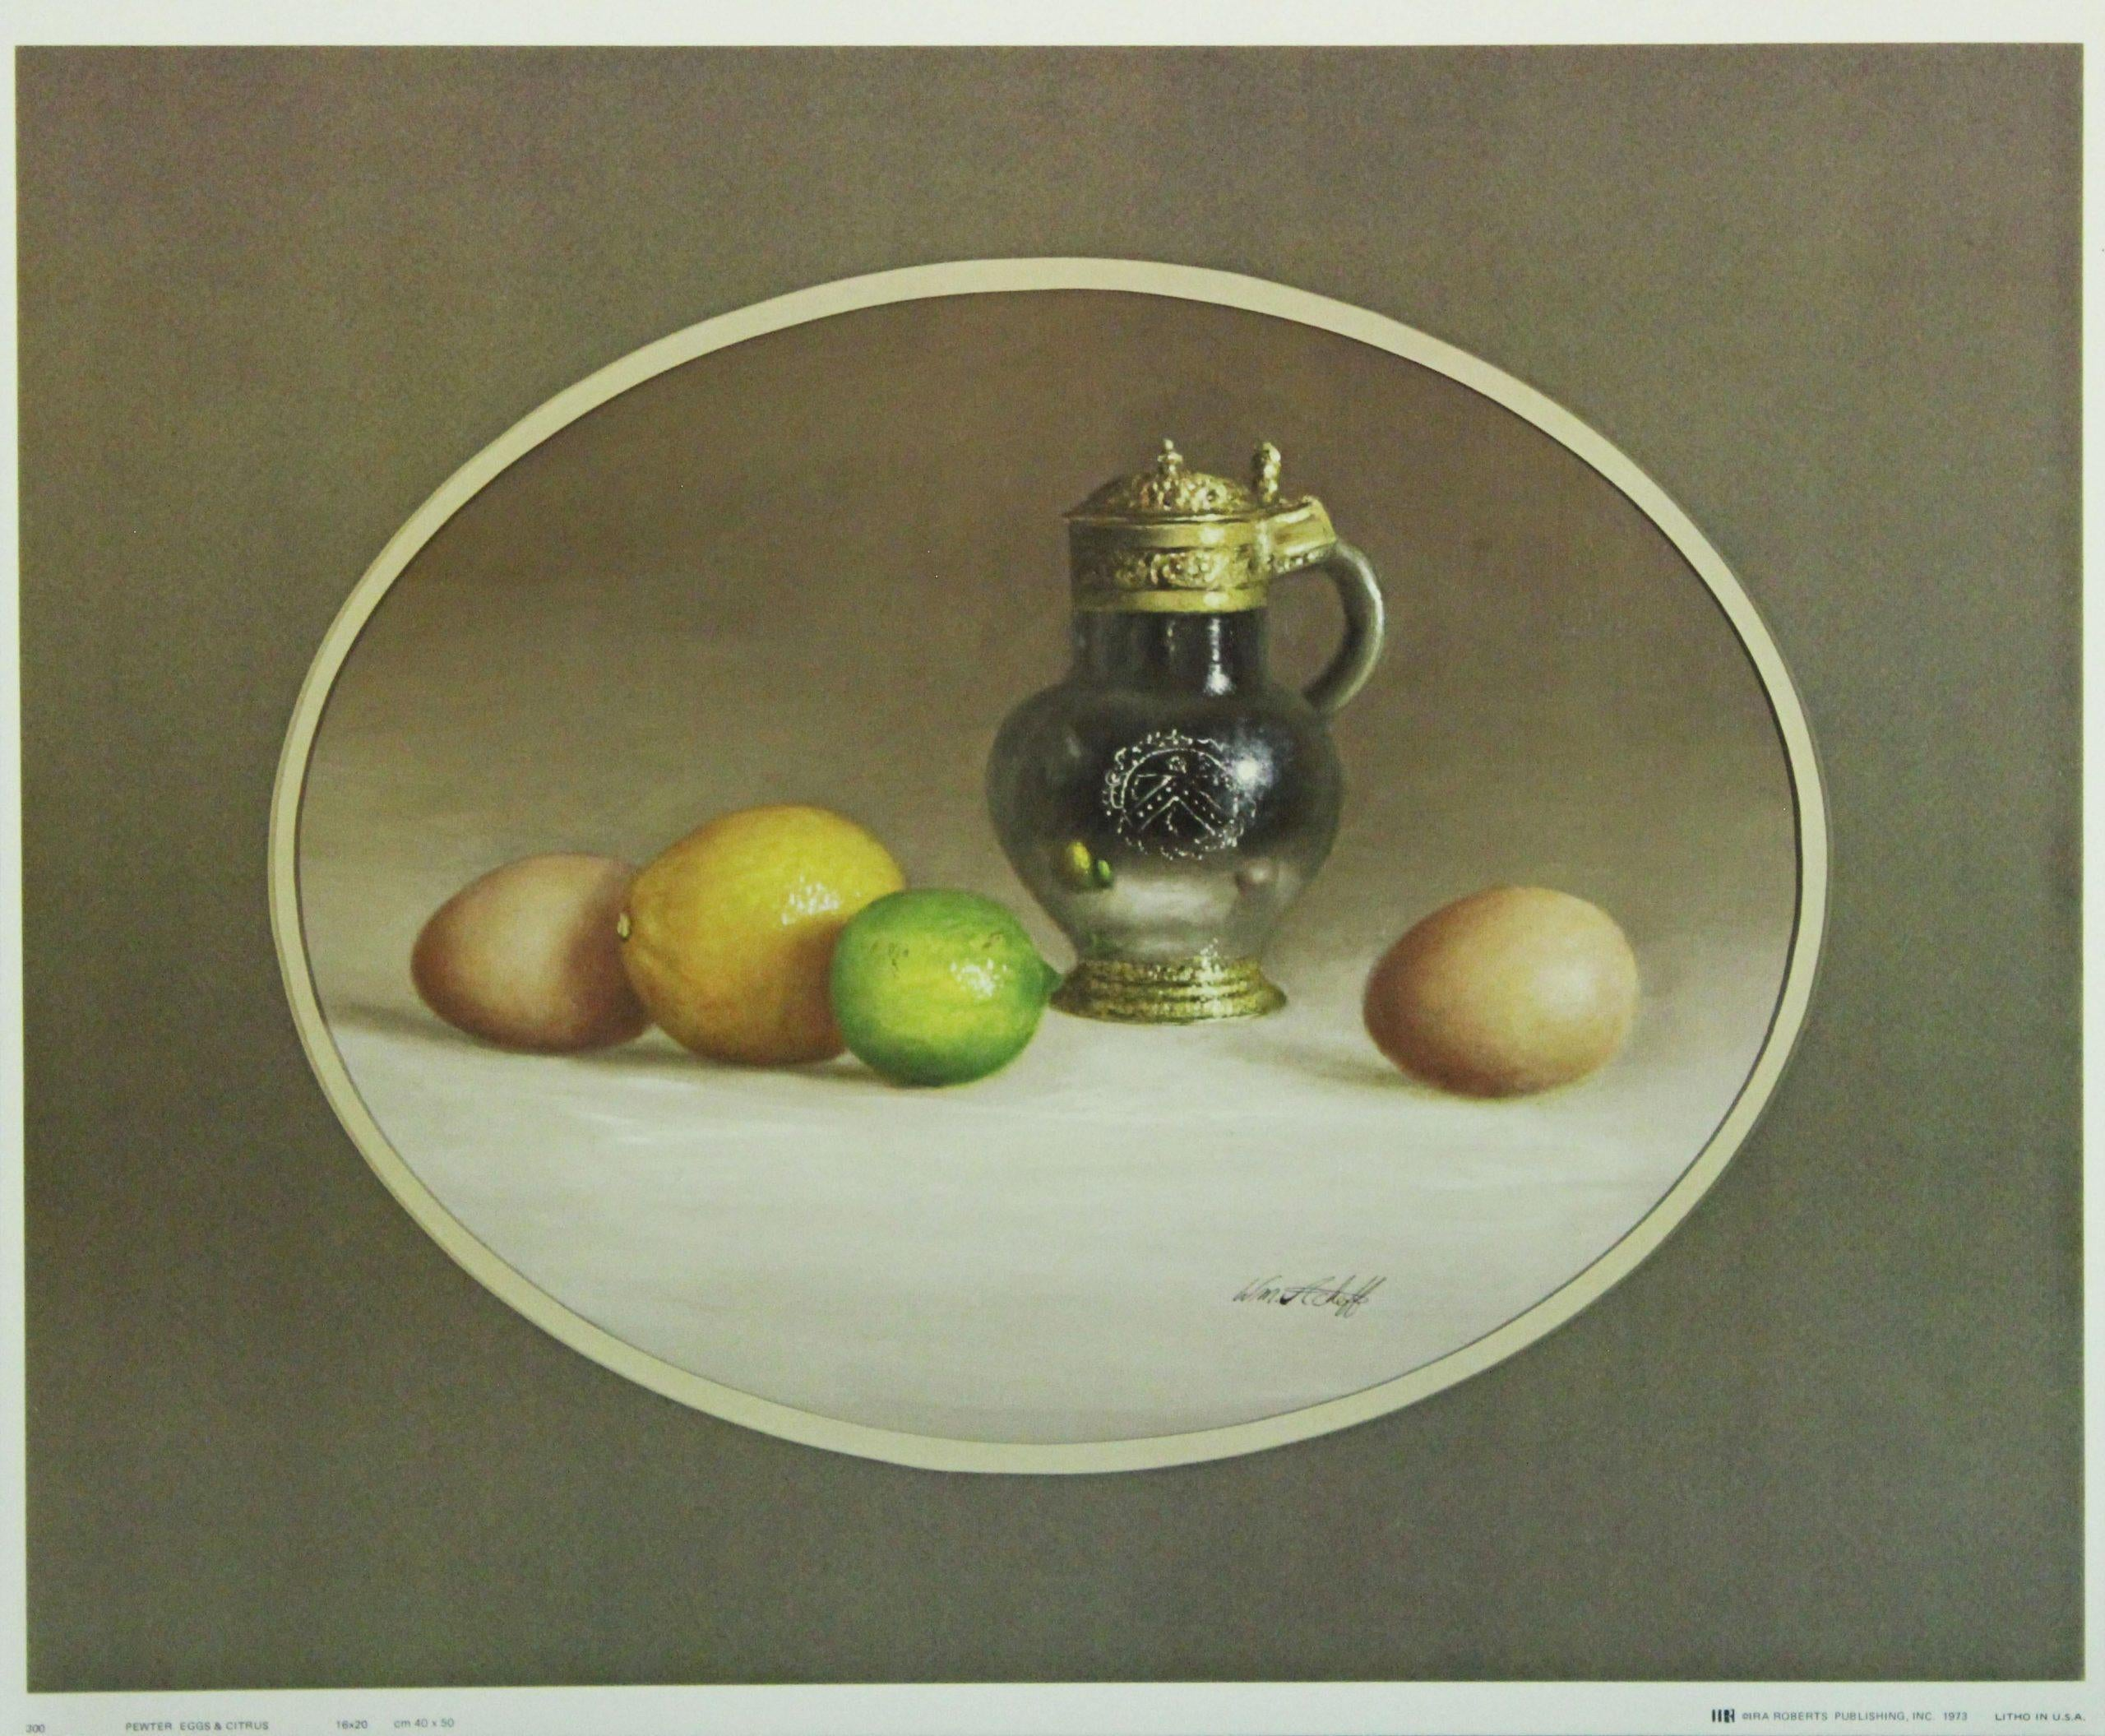 Pewter Eggs & Citrus-Print. IRA Roberts Publishing, Inc. 1973.